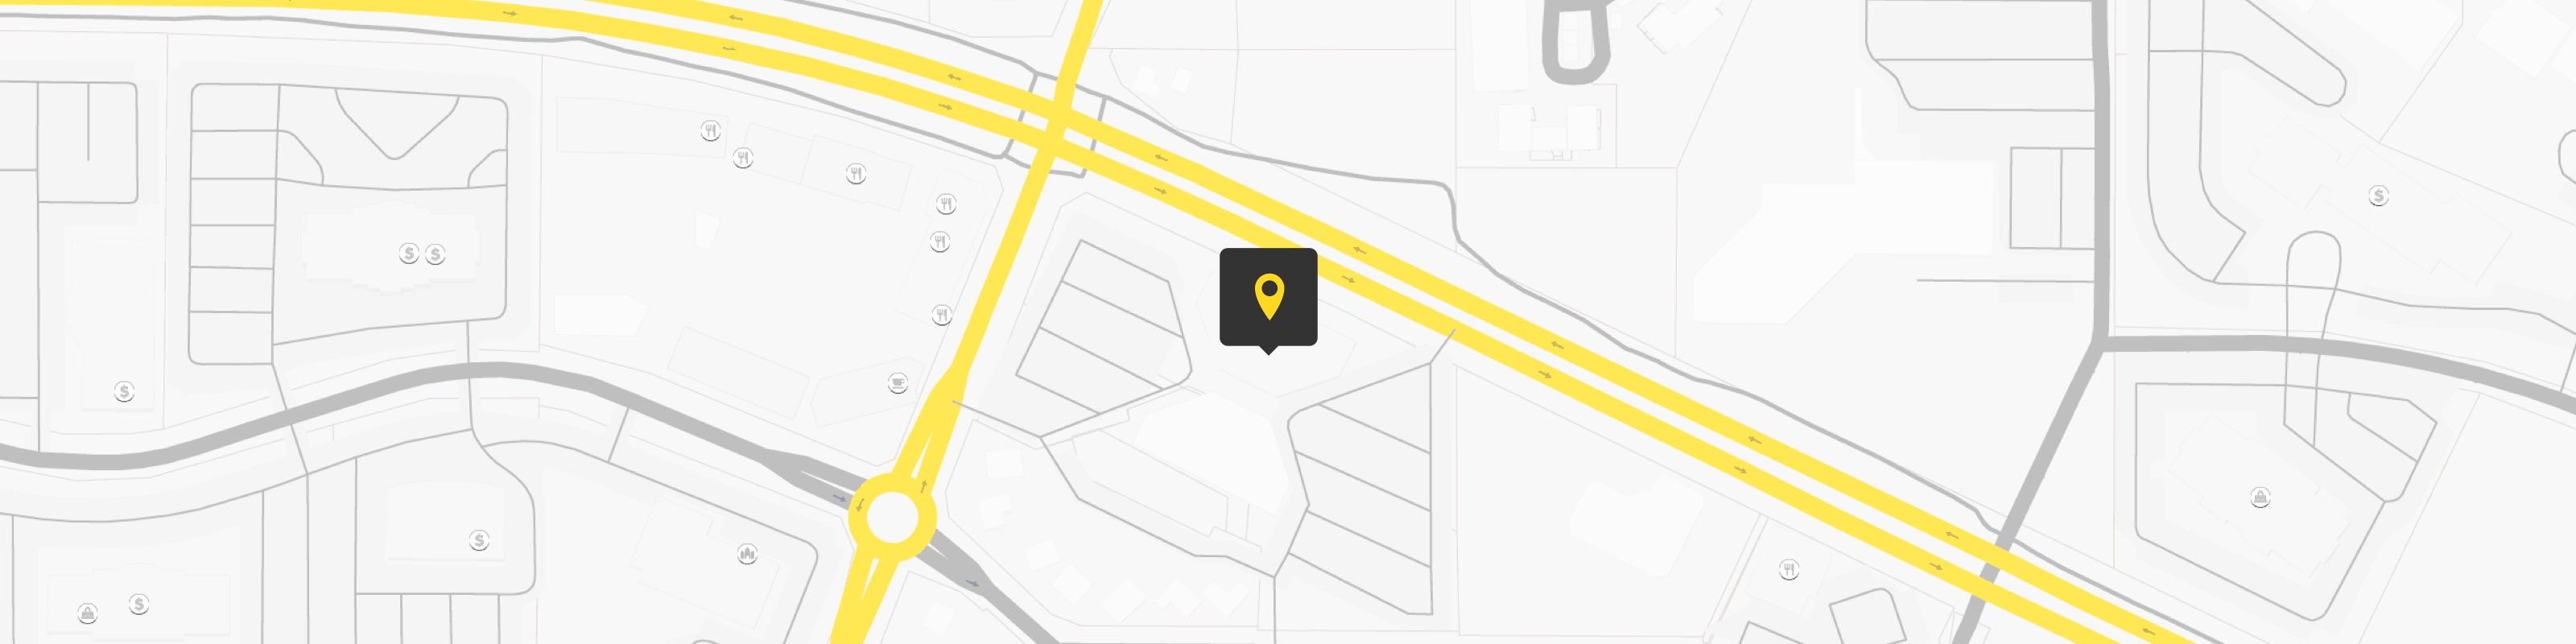 contact-us-map.jpg